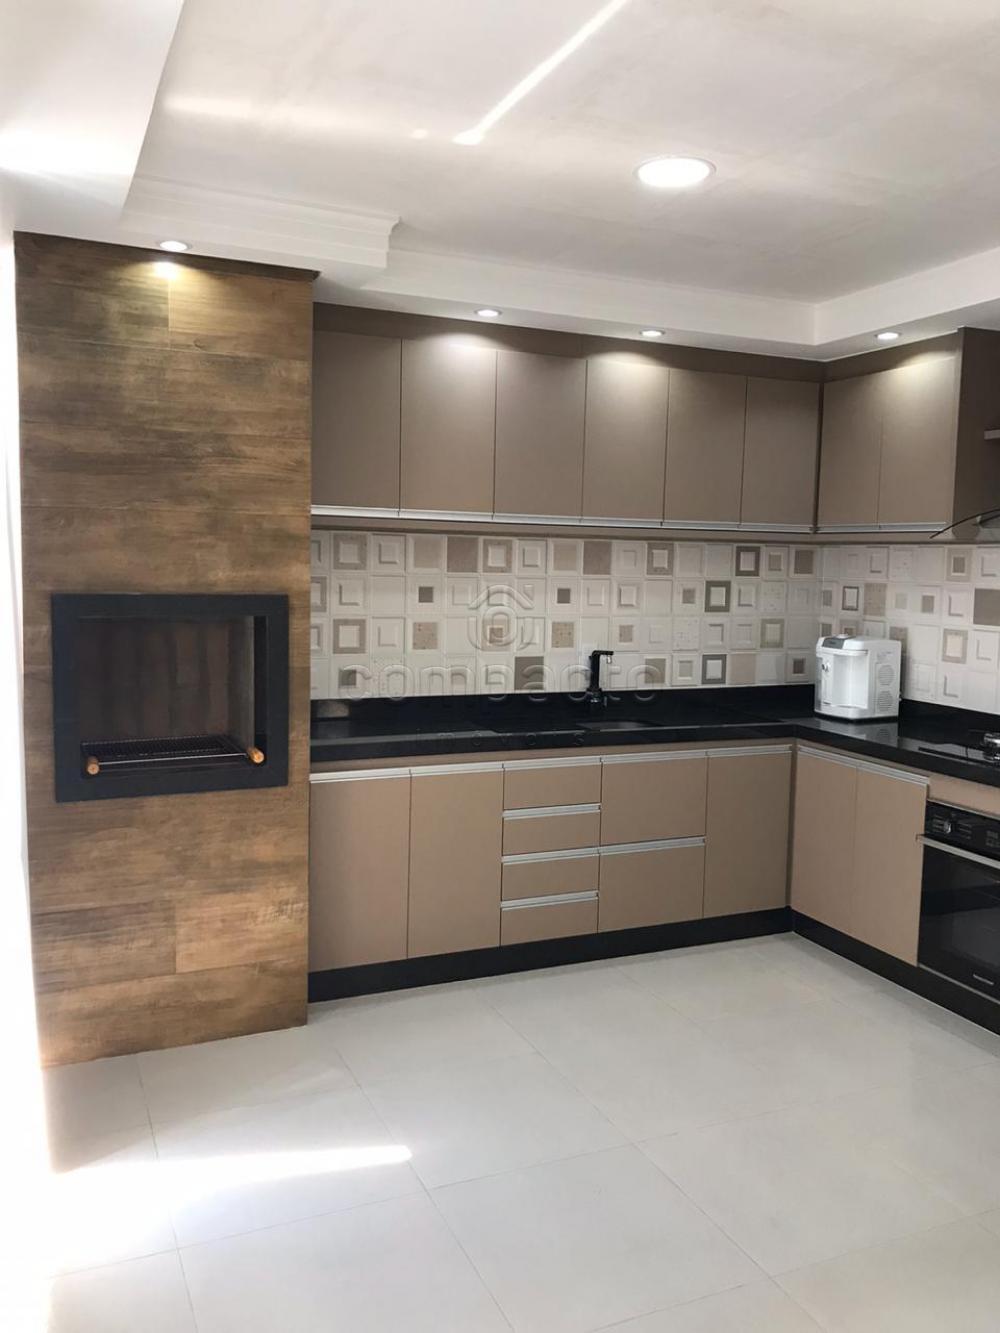 Sao Jose do Rio Preto Apartamento Venda R$299.000,00 Condominio R$200,00 3 Dormitorios 1 Suite Area construida 140.00m2